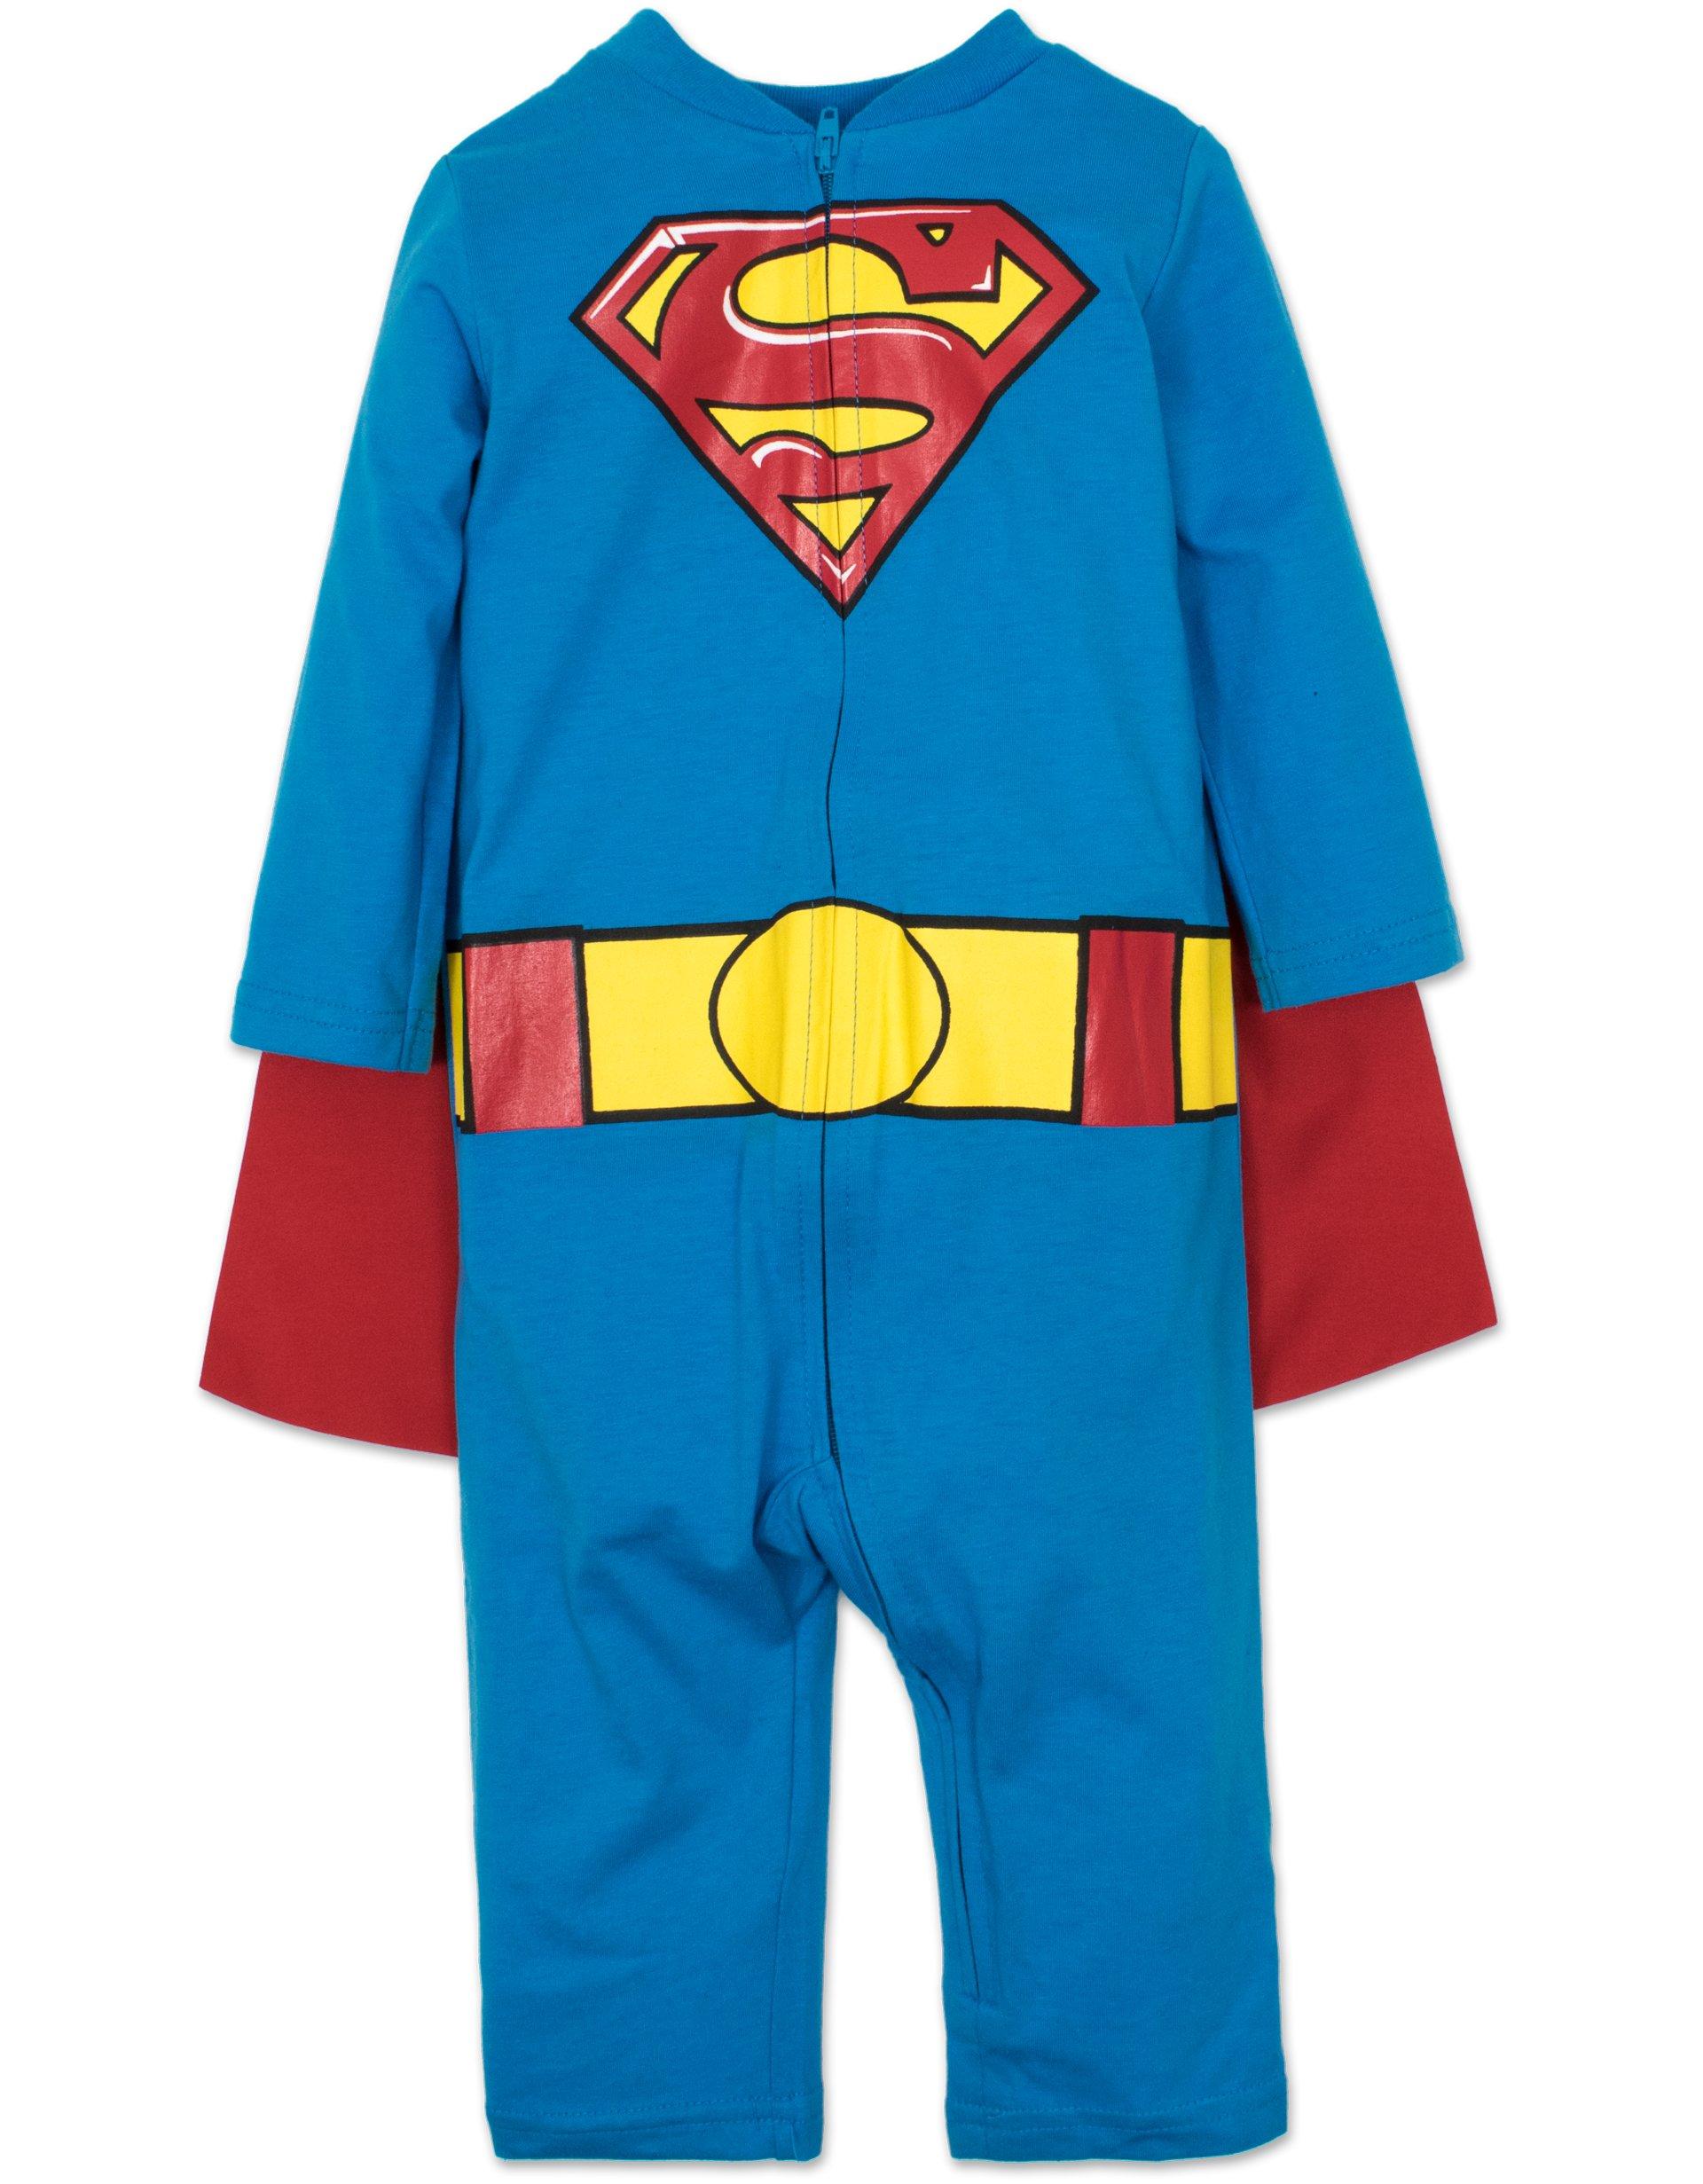 Warner Bros. Batman & Superman Baby Boys' Costume Coveralls with Cape